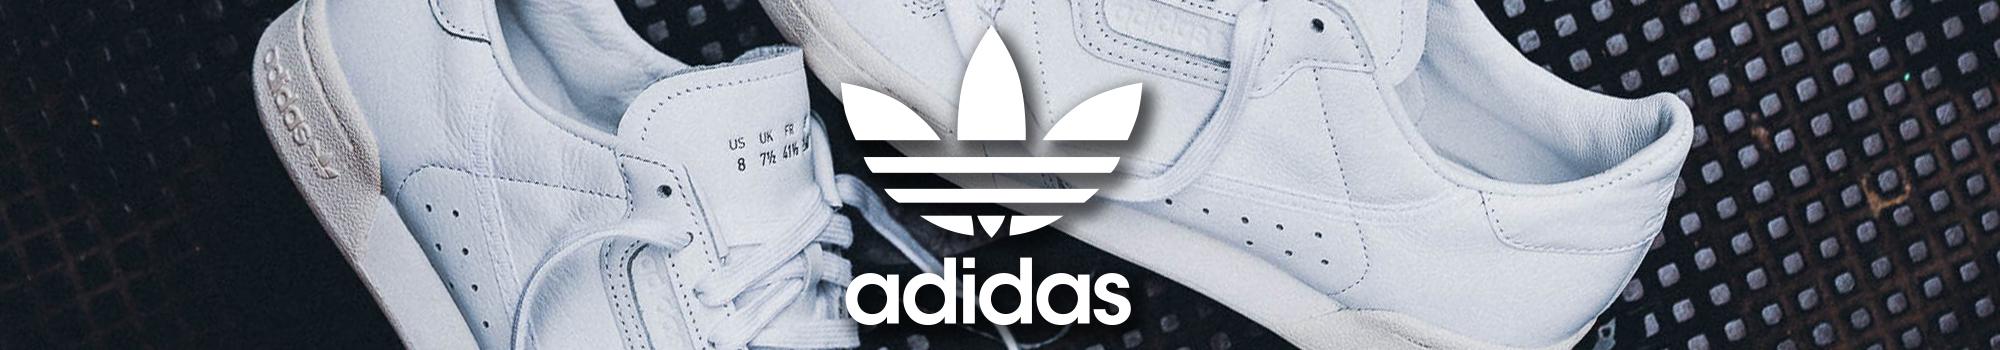 ban_adidas.jpg